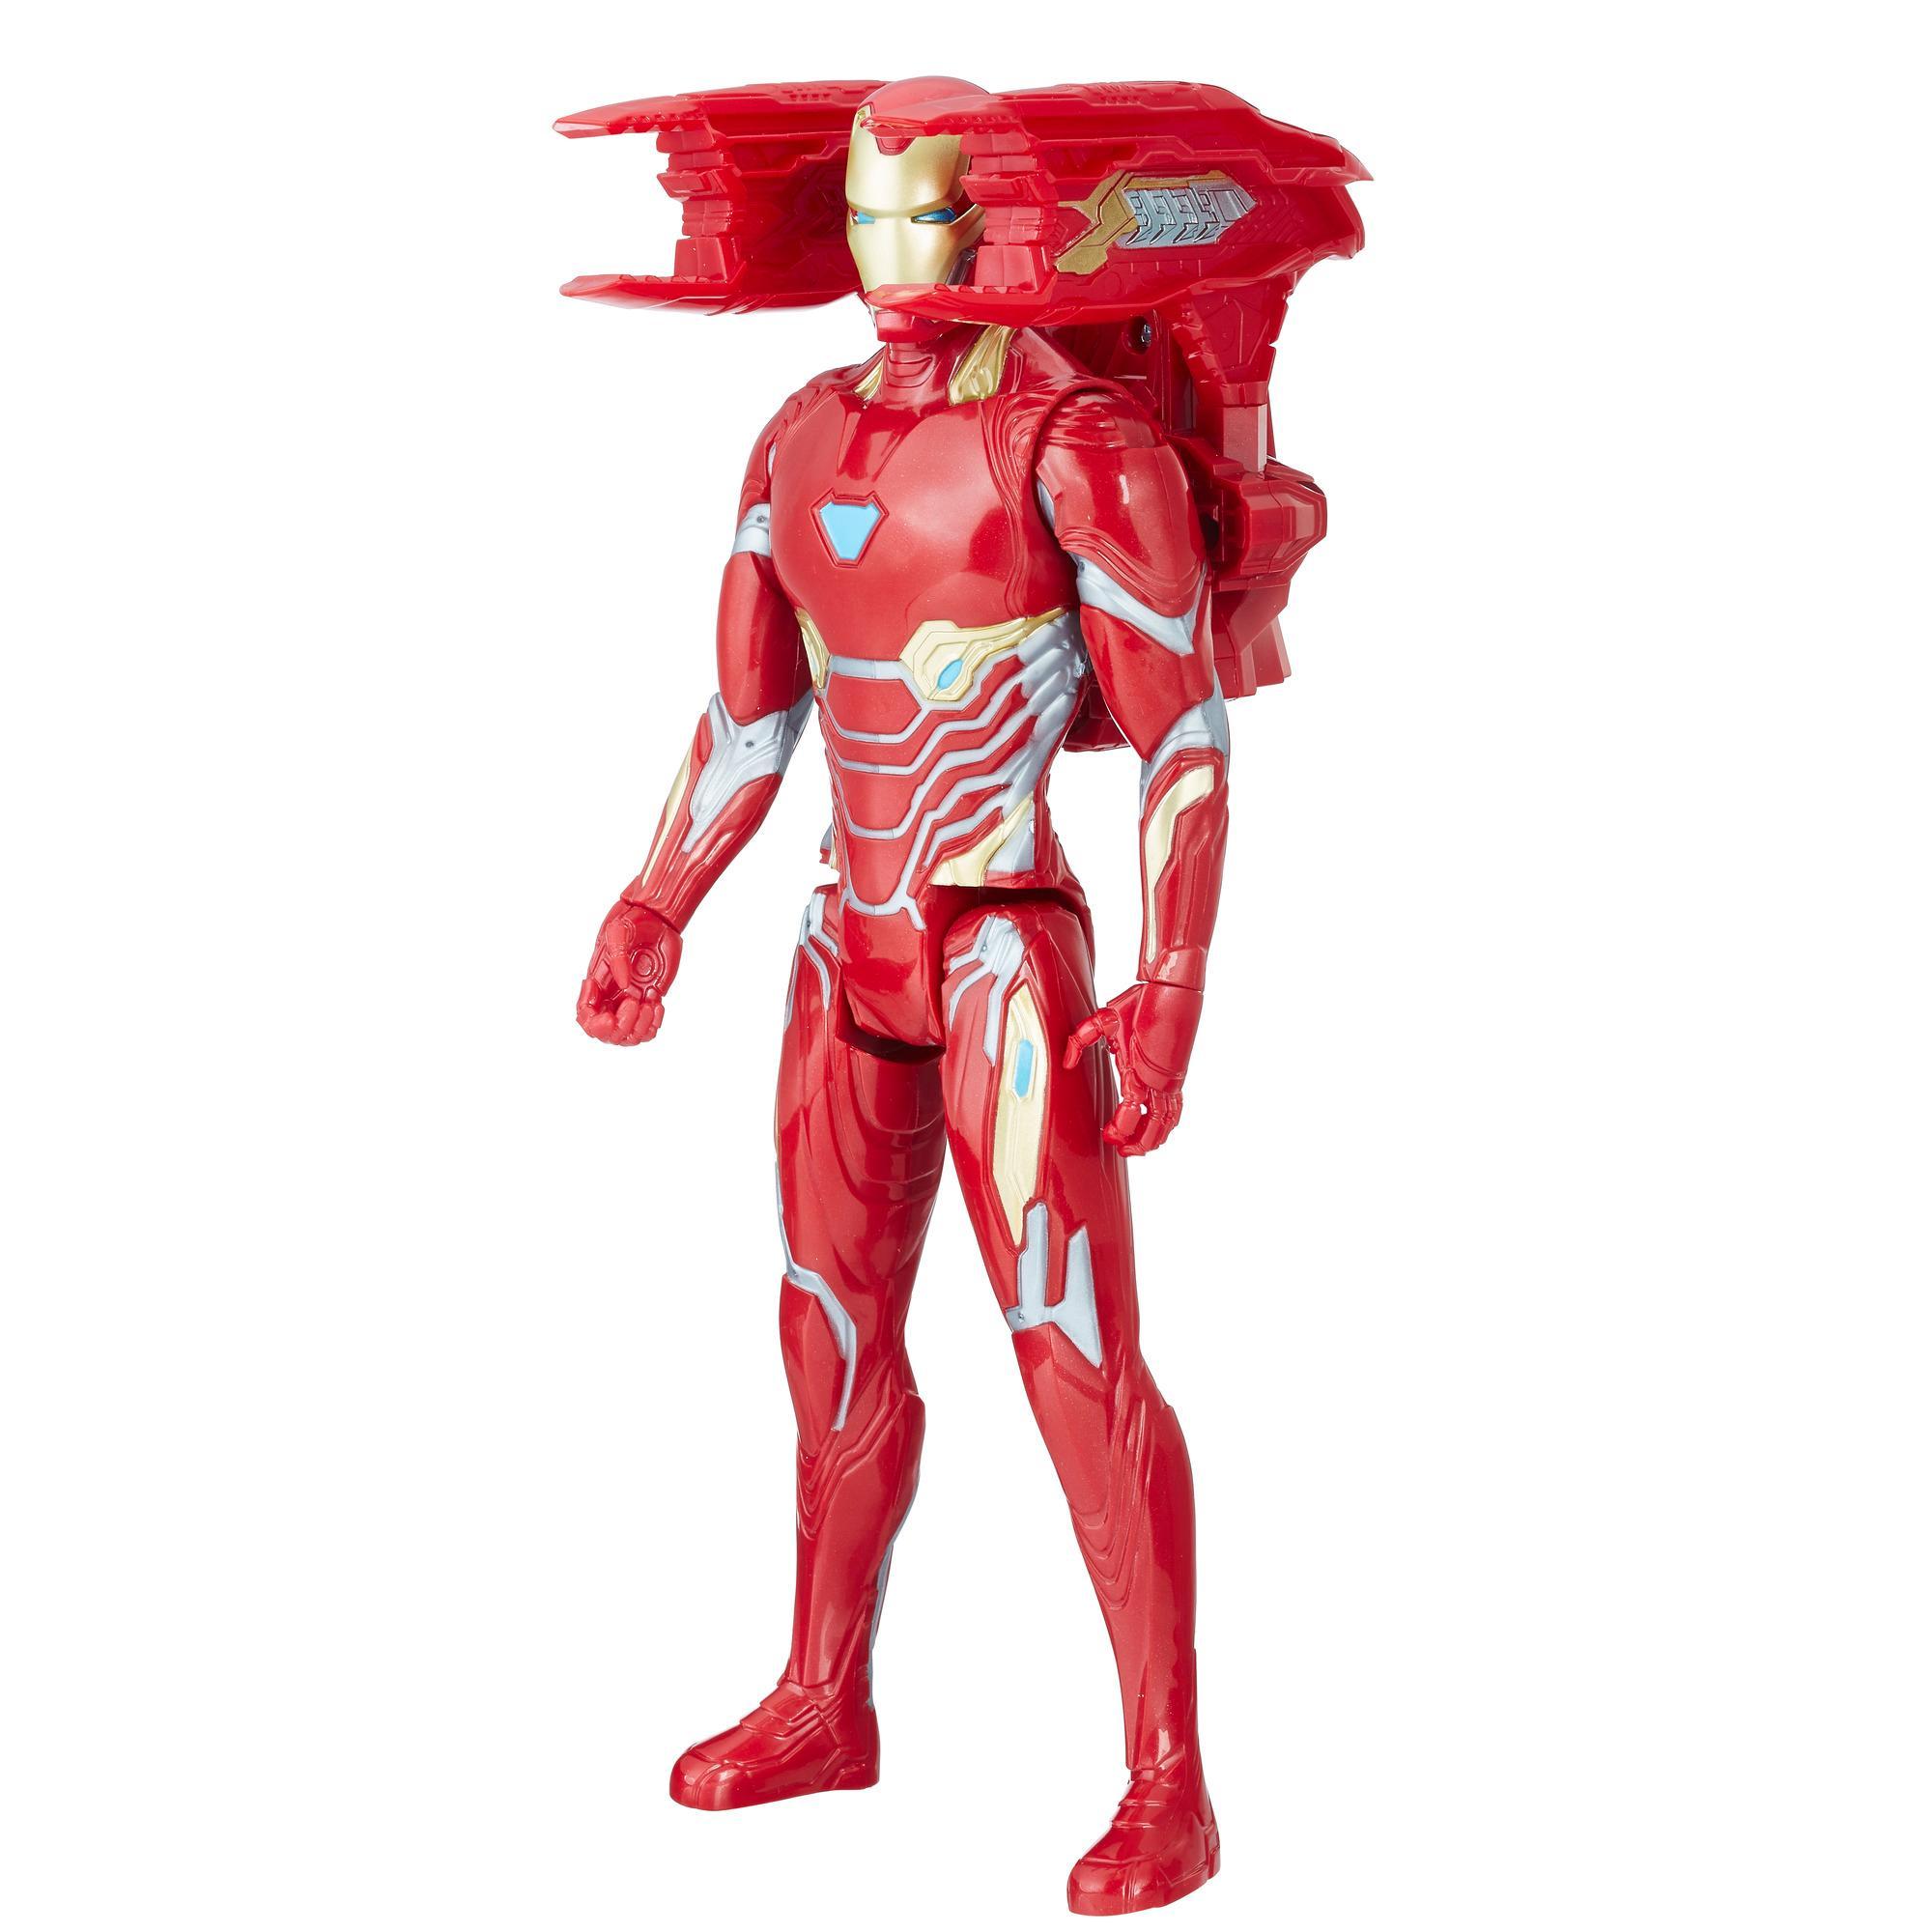 Avengers: Infinity War - Iron Man Titan Hero Power FX (Personaggio 30cm, Action Figure)